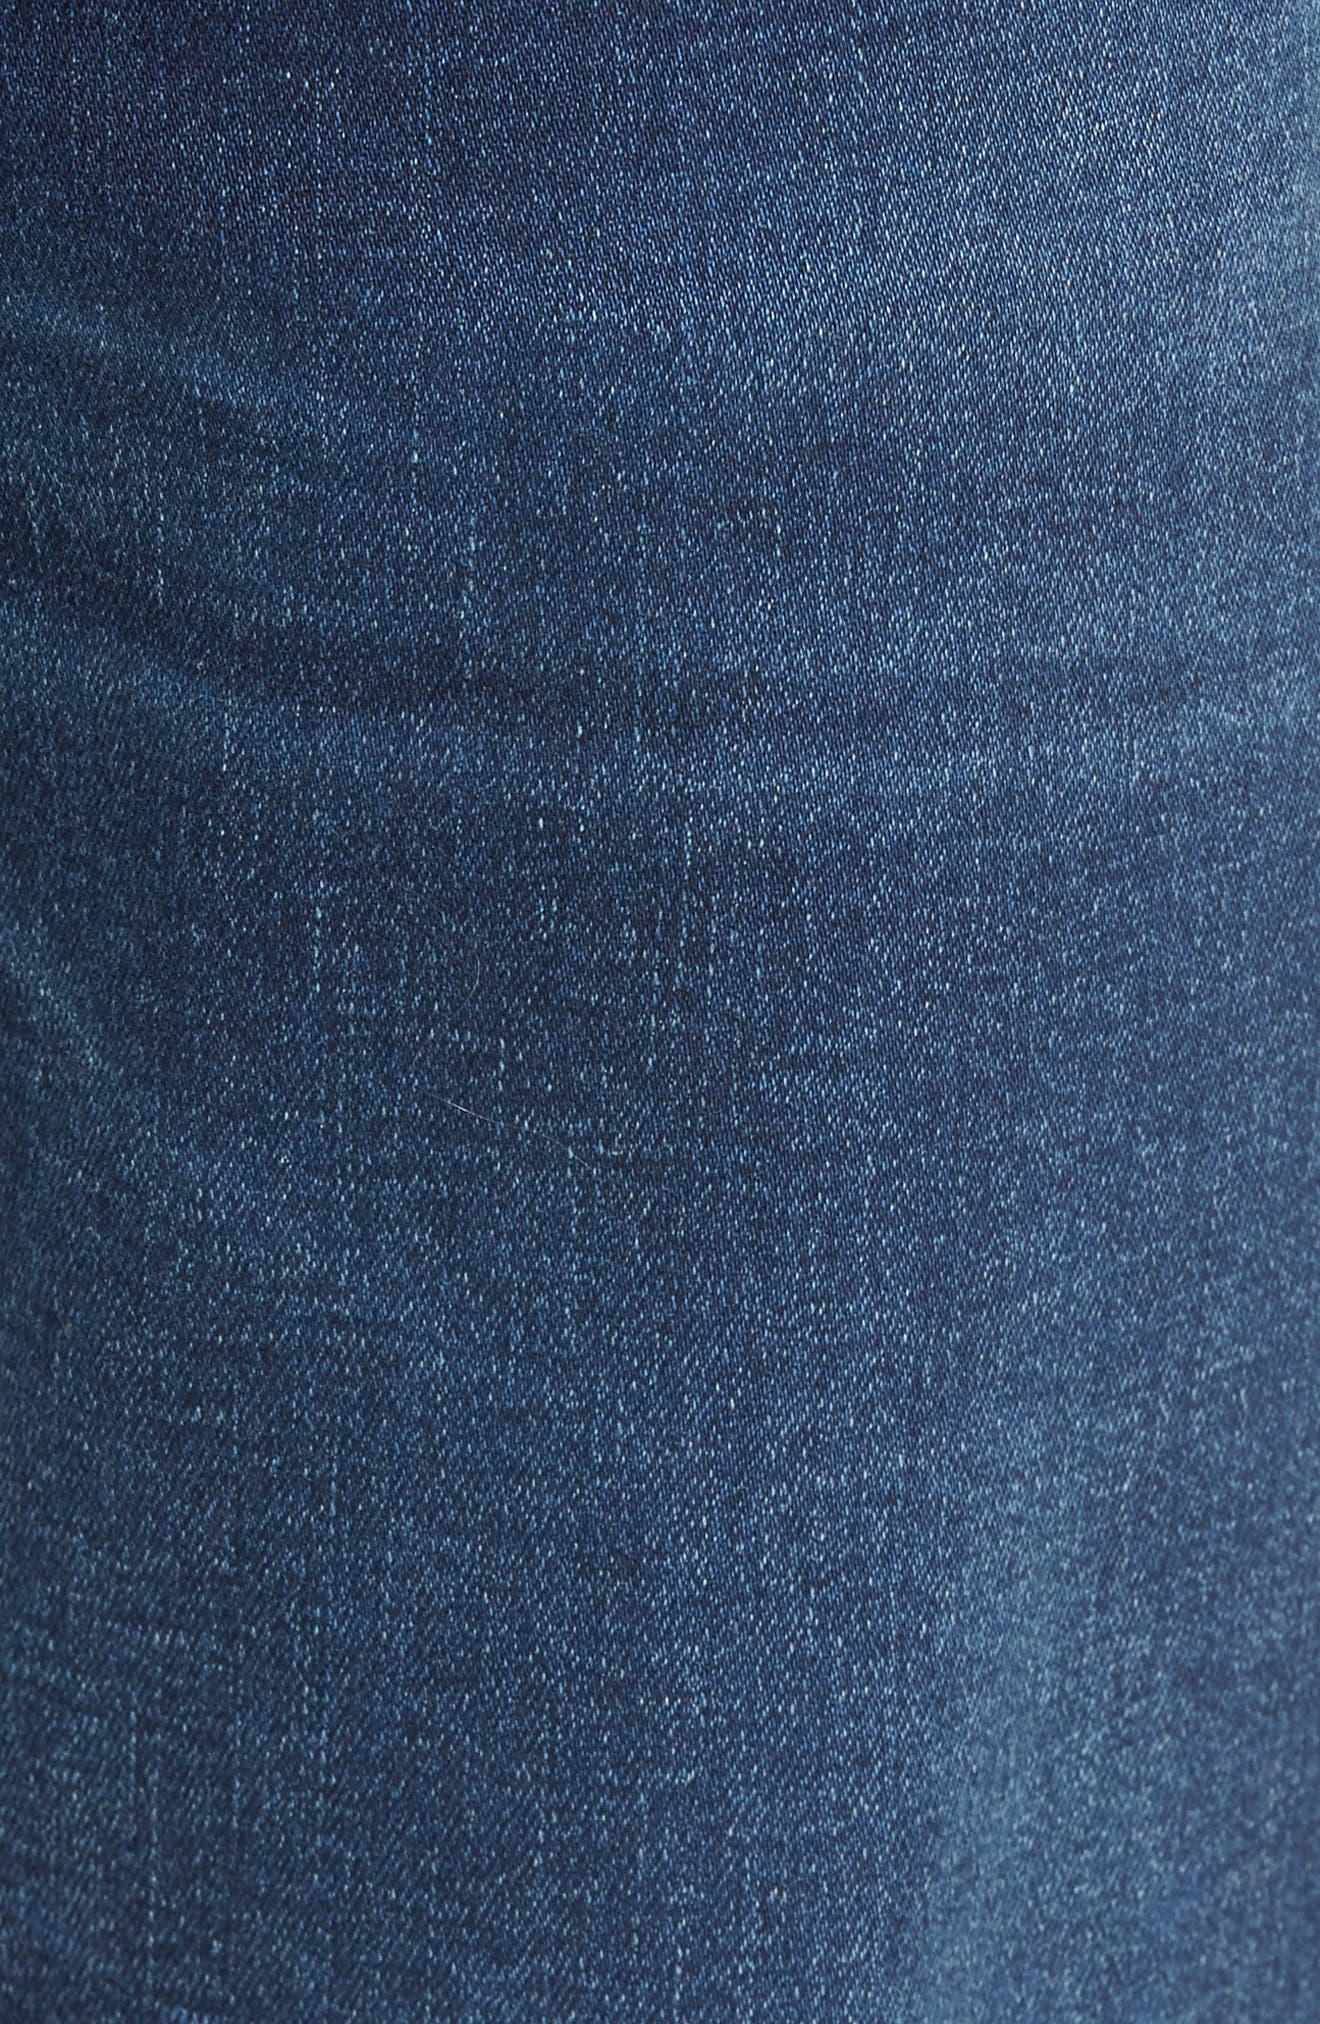 PERFORM - Gage Slim Straight Leg Jeans,                             Alternate thumbnail 5, color,                             Turner